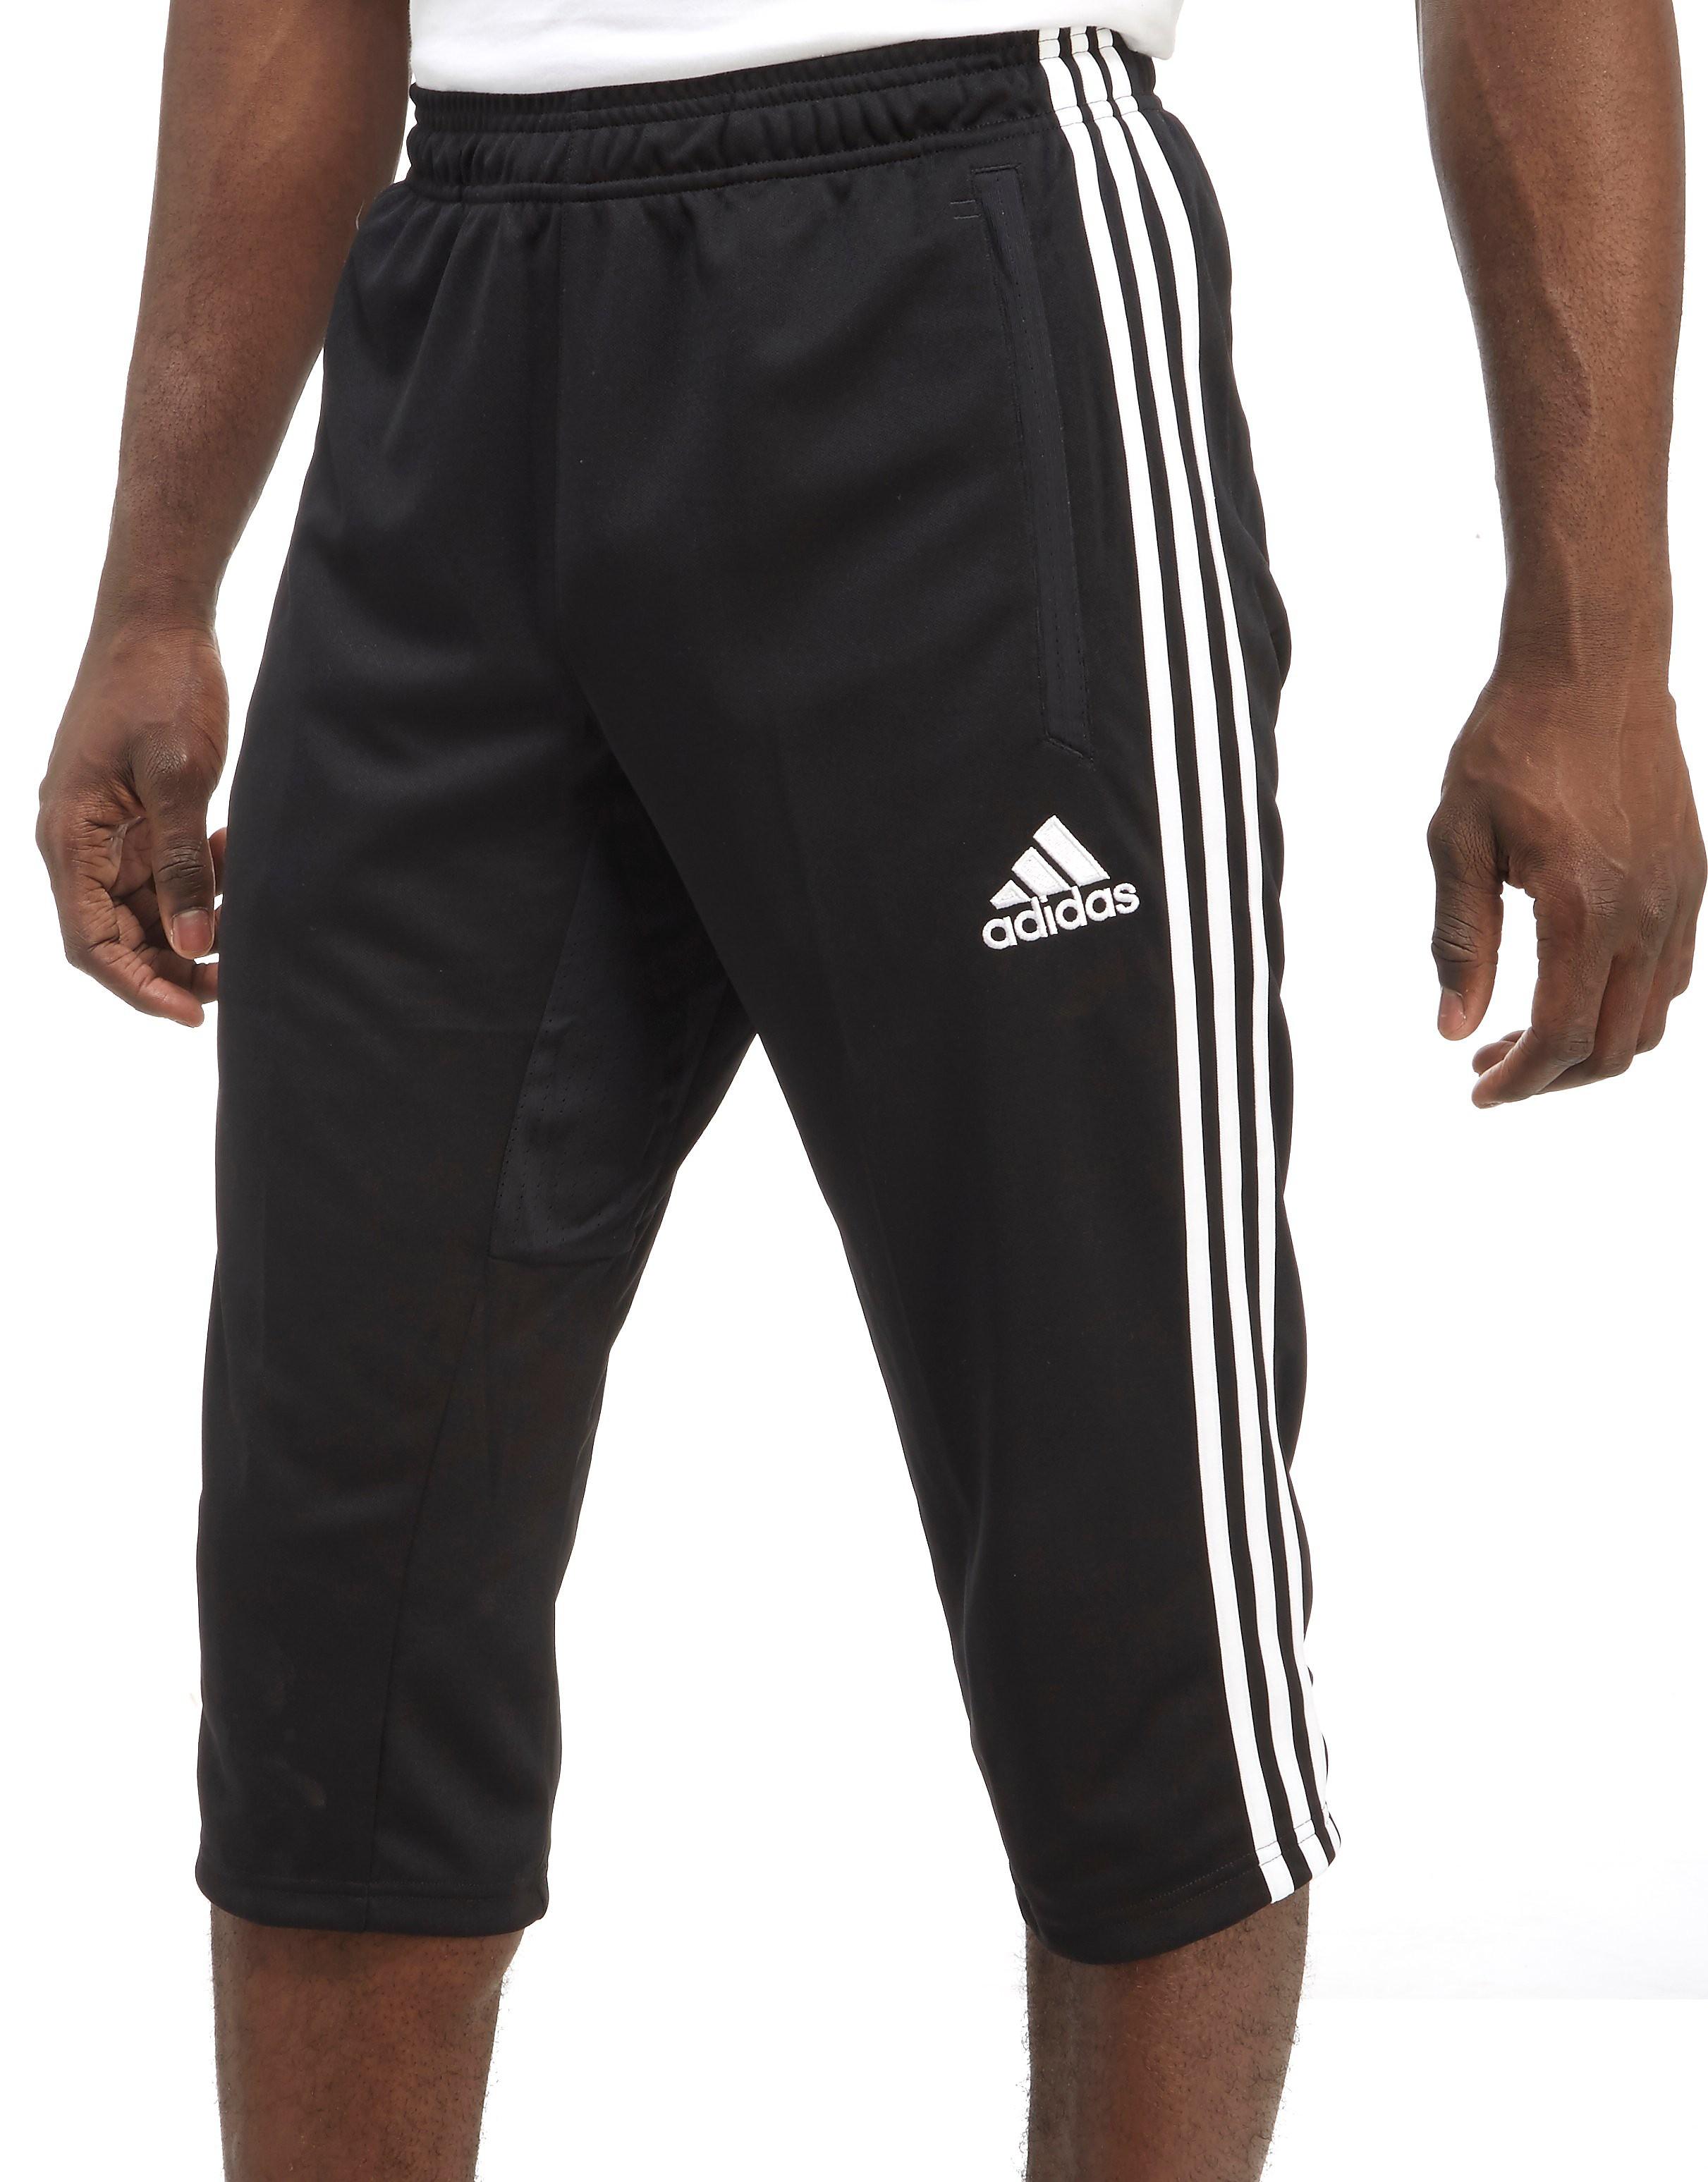 adidas Tango 3/4 Football Pants